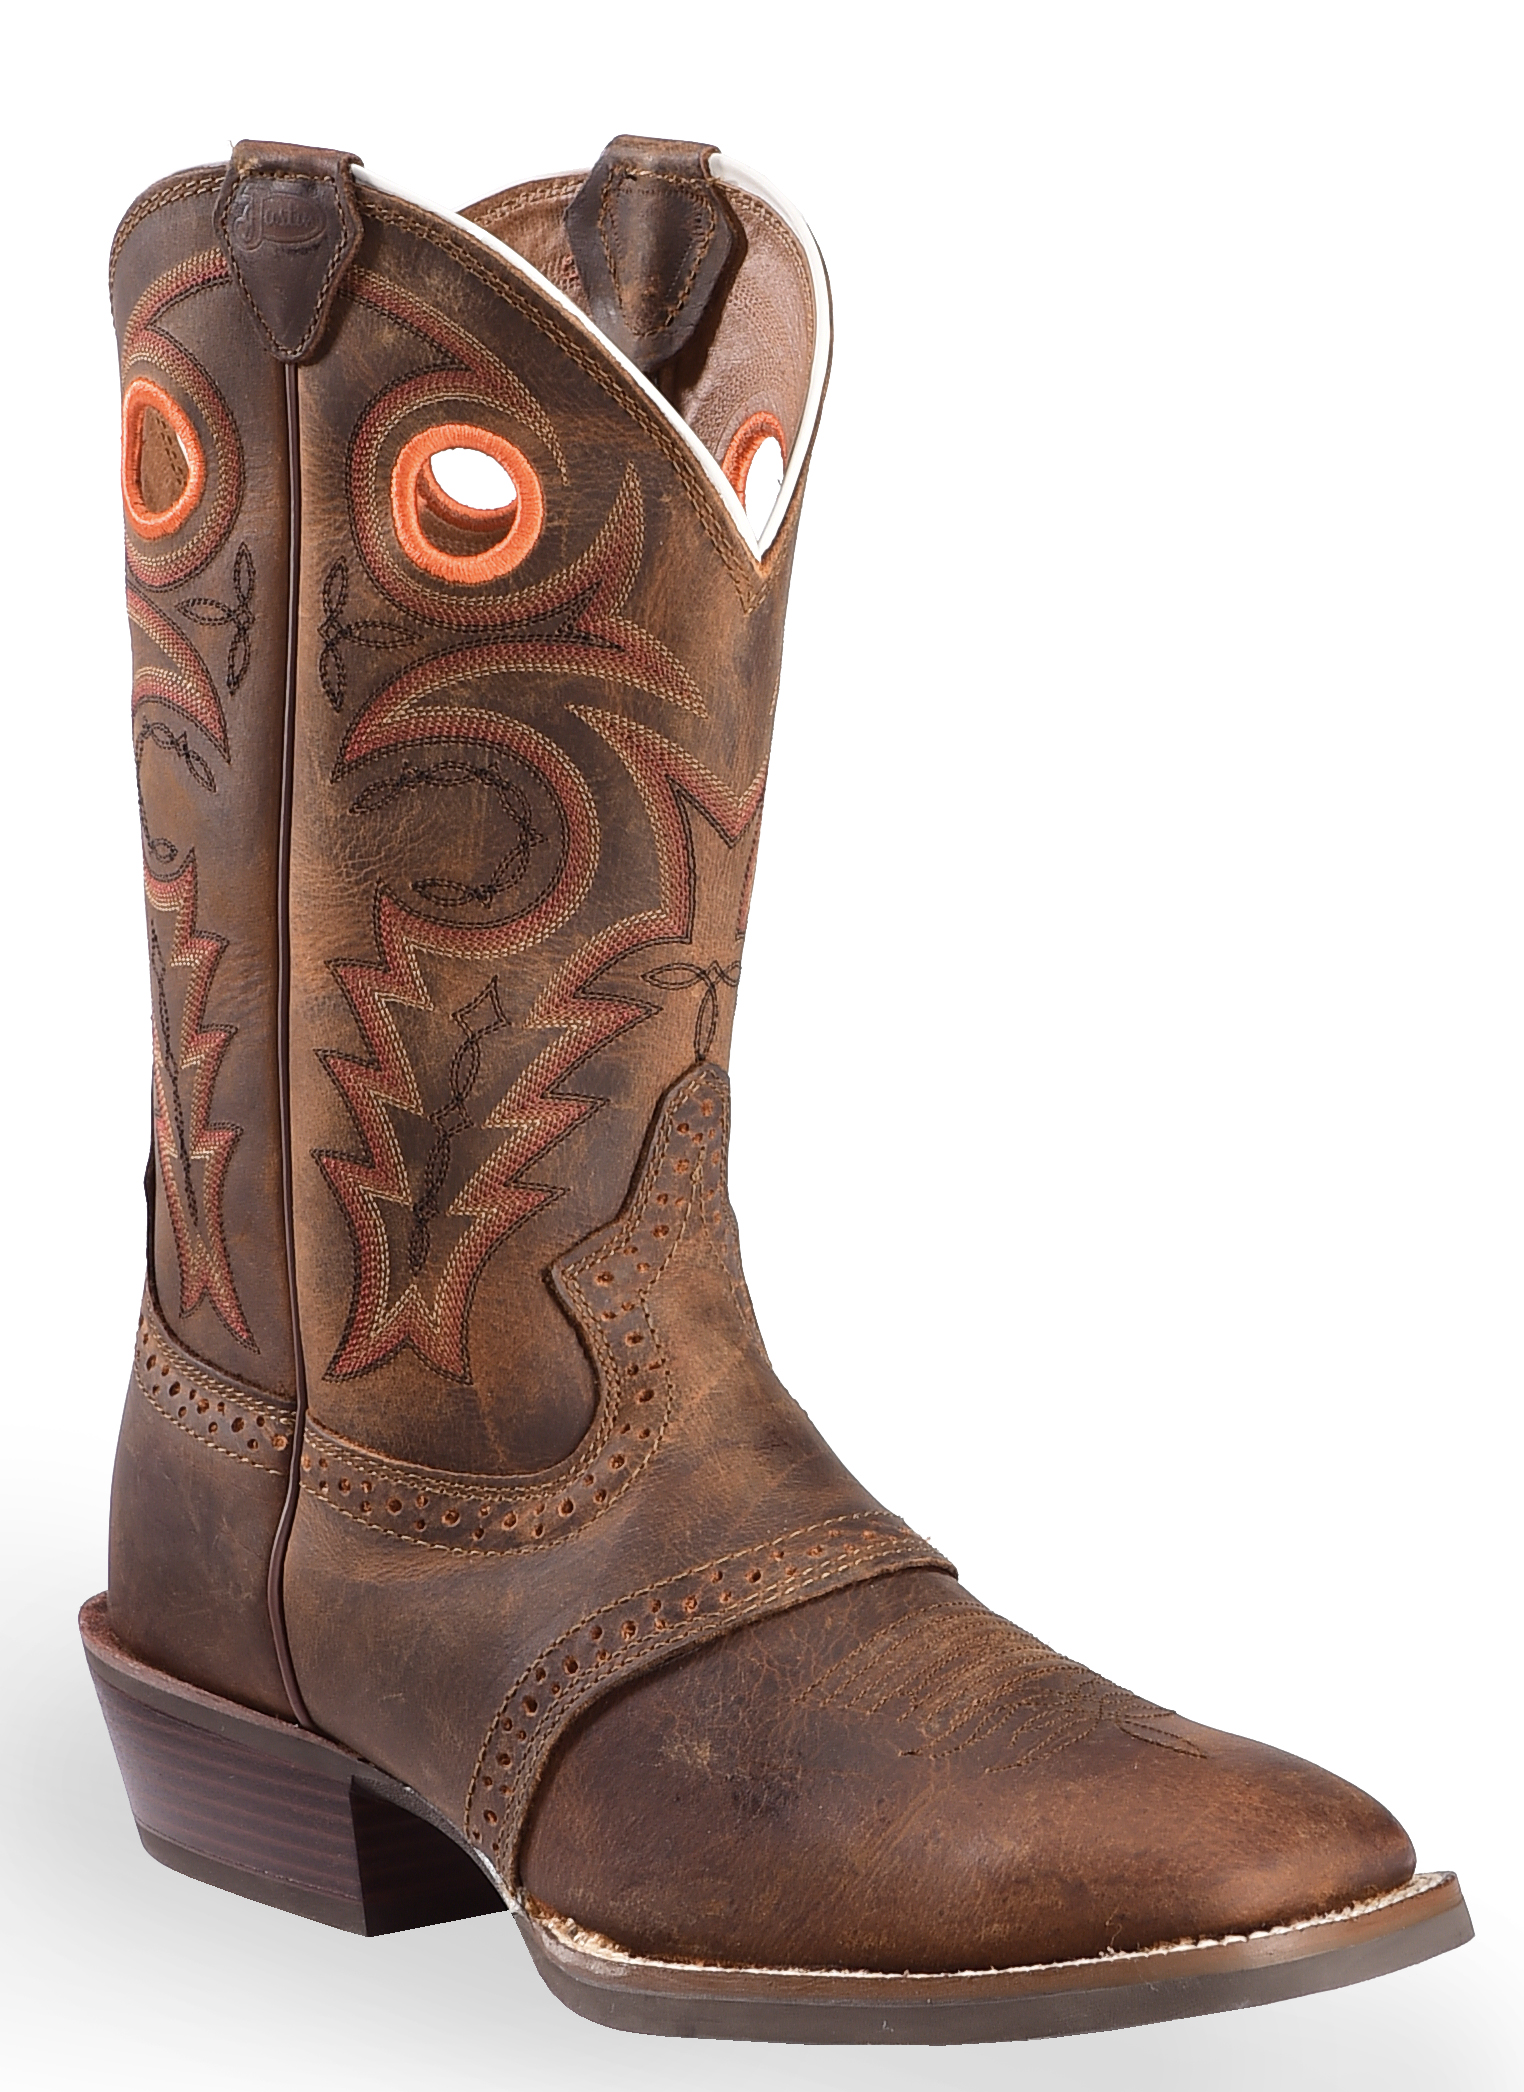 Men&39s Justin Boots - Sheplers